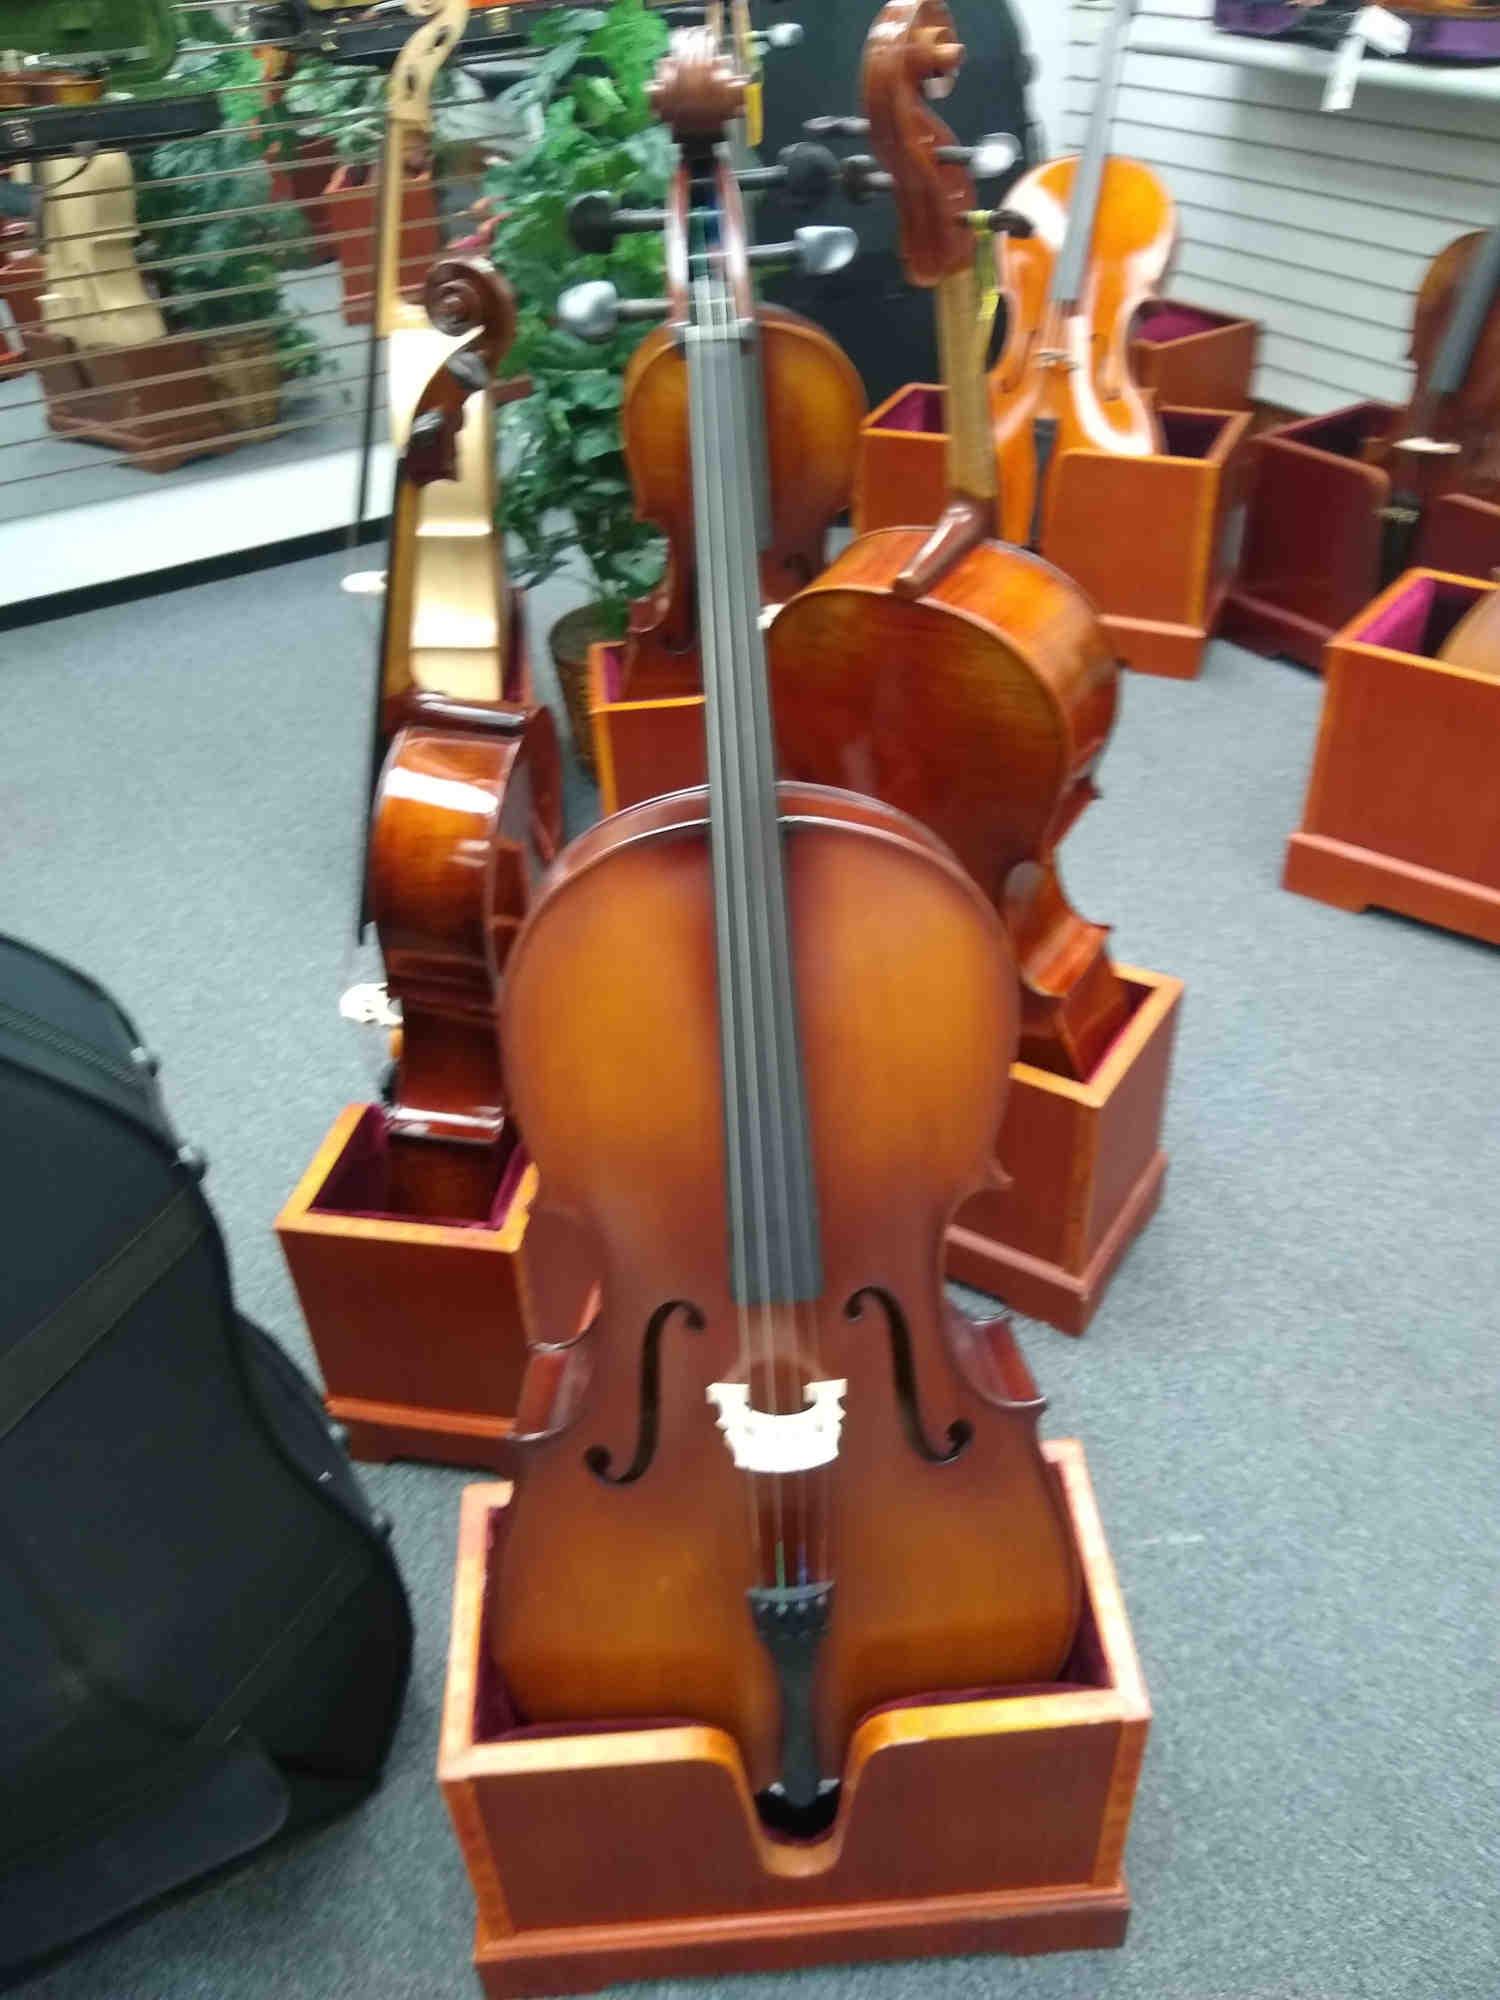 Vienna Strings Hamburg Cello New for 2021